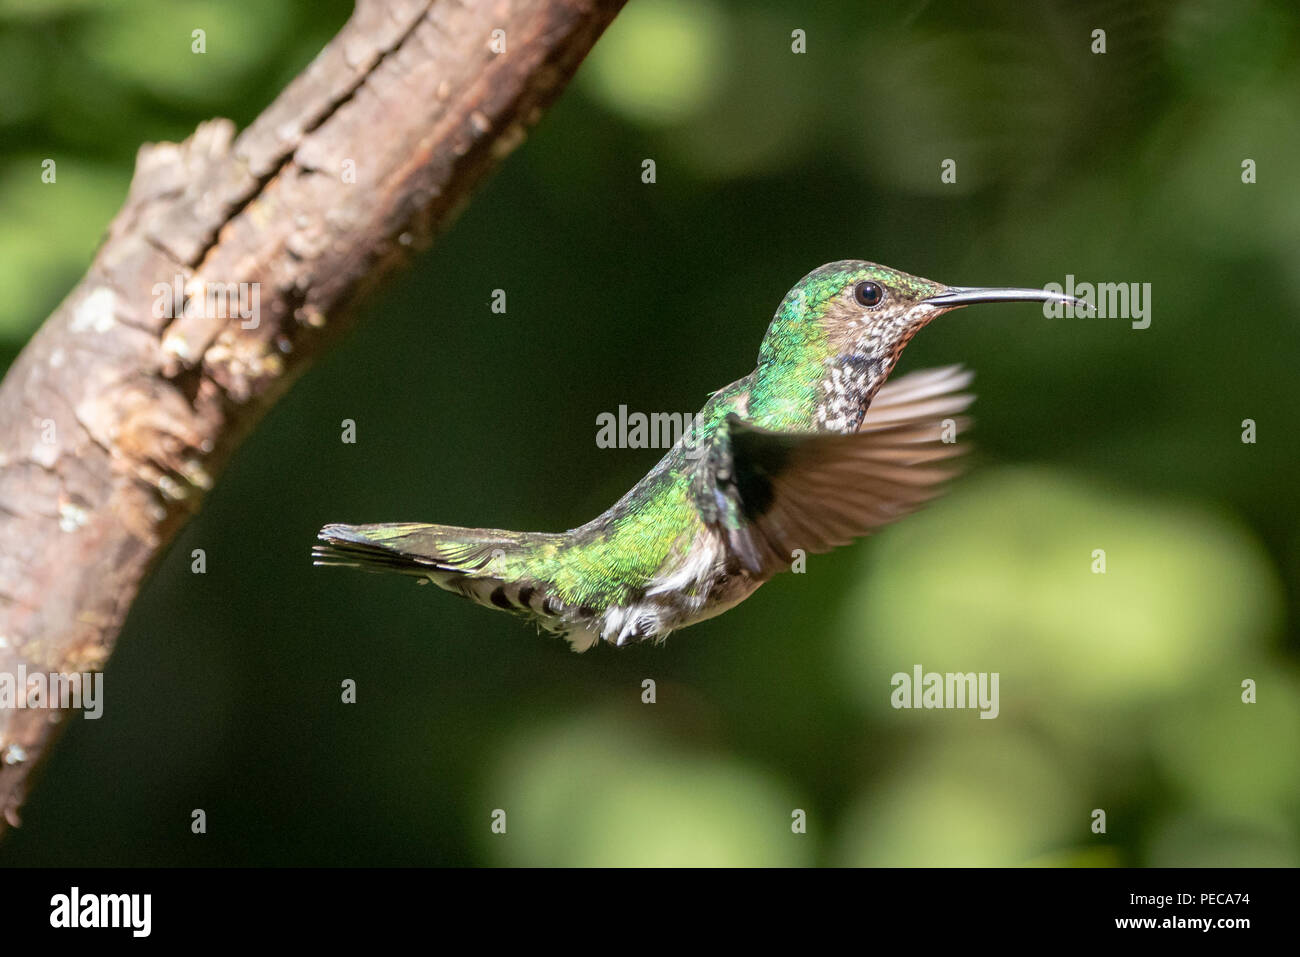 Hummingbird in flight, Mindo Cloud Forest, Ecuador - Stock Image